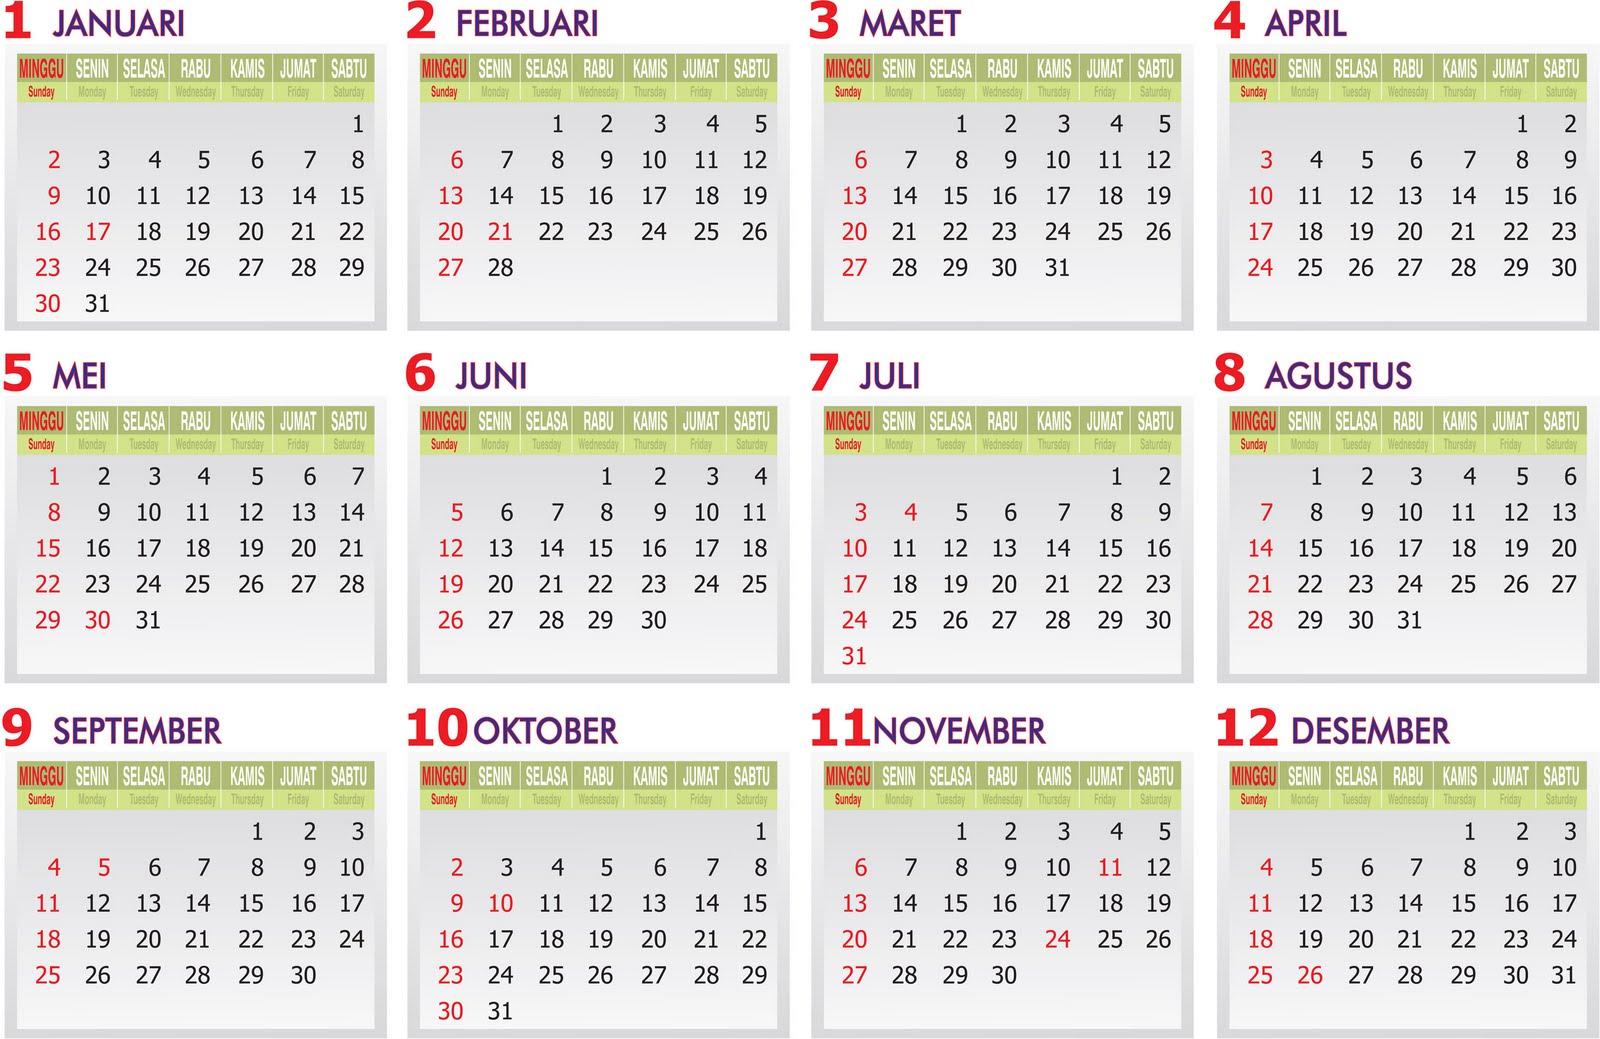 ), daftar libur bersama dan cuti bersama 2011 adalah sebagai berikut